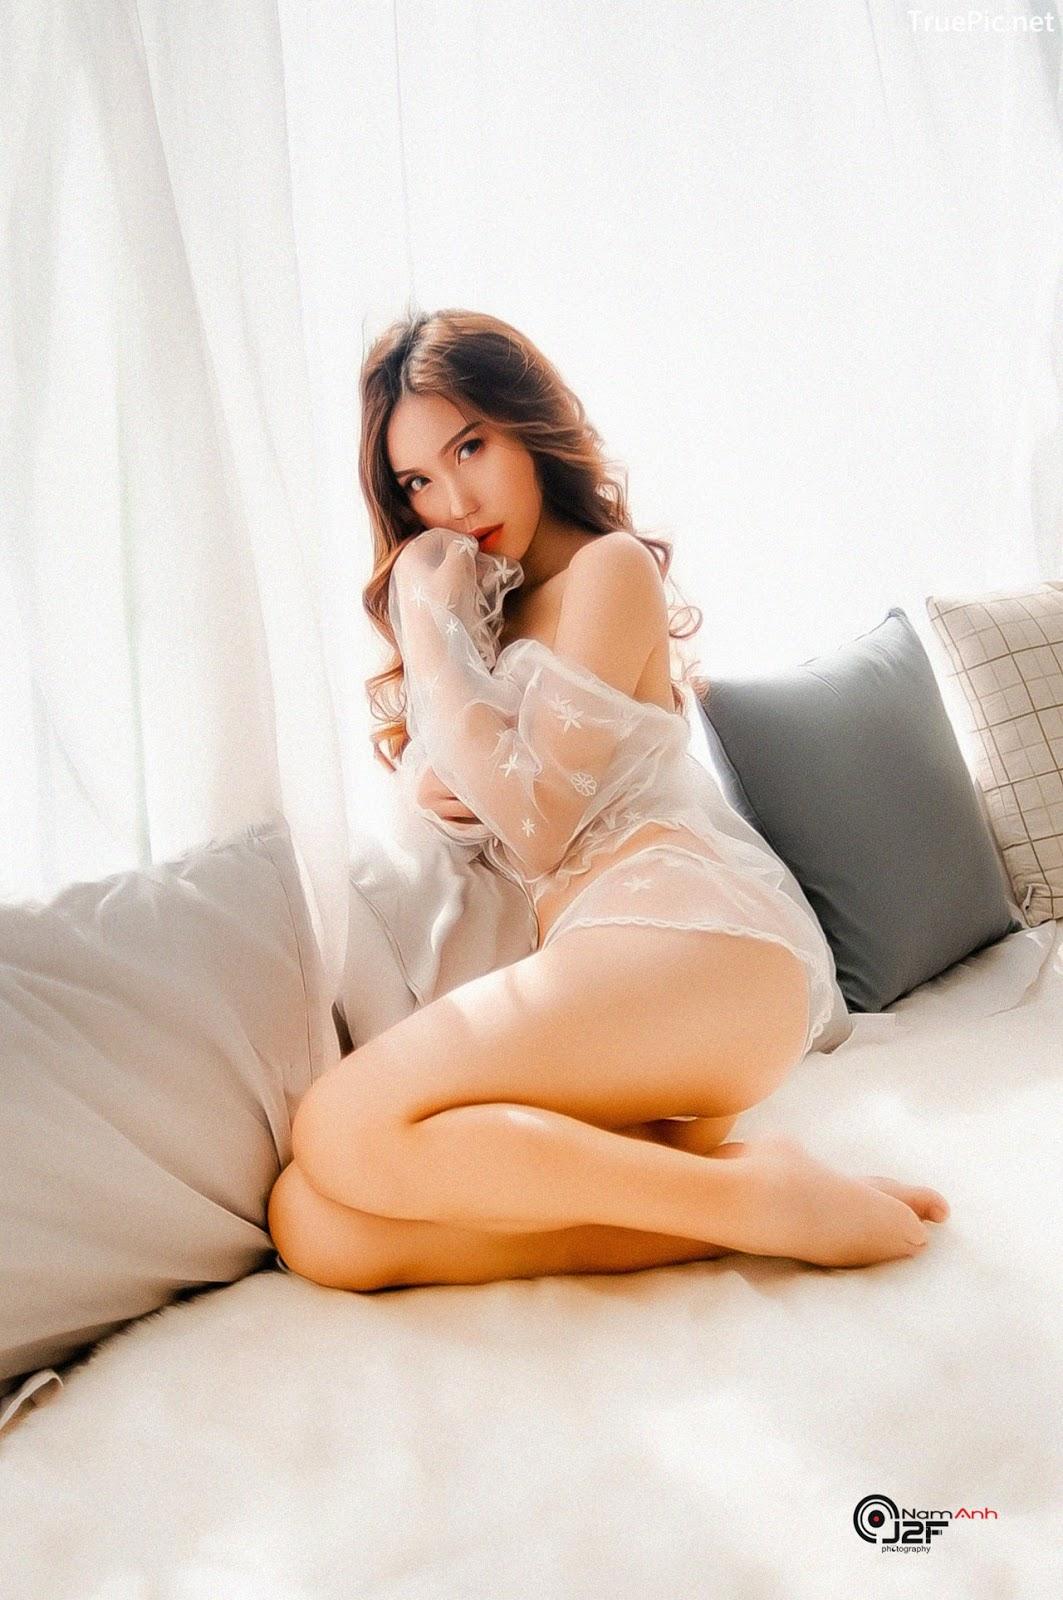 Image Vietnamese Model – Sexy Beauty of Beautiful Girls Taken by NamAnh Photo #8 - TruePic.net - Picture-6